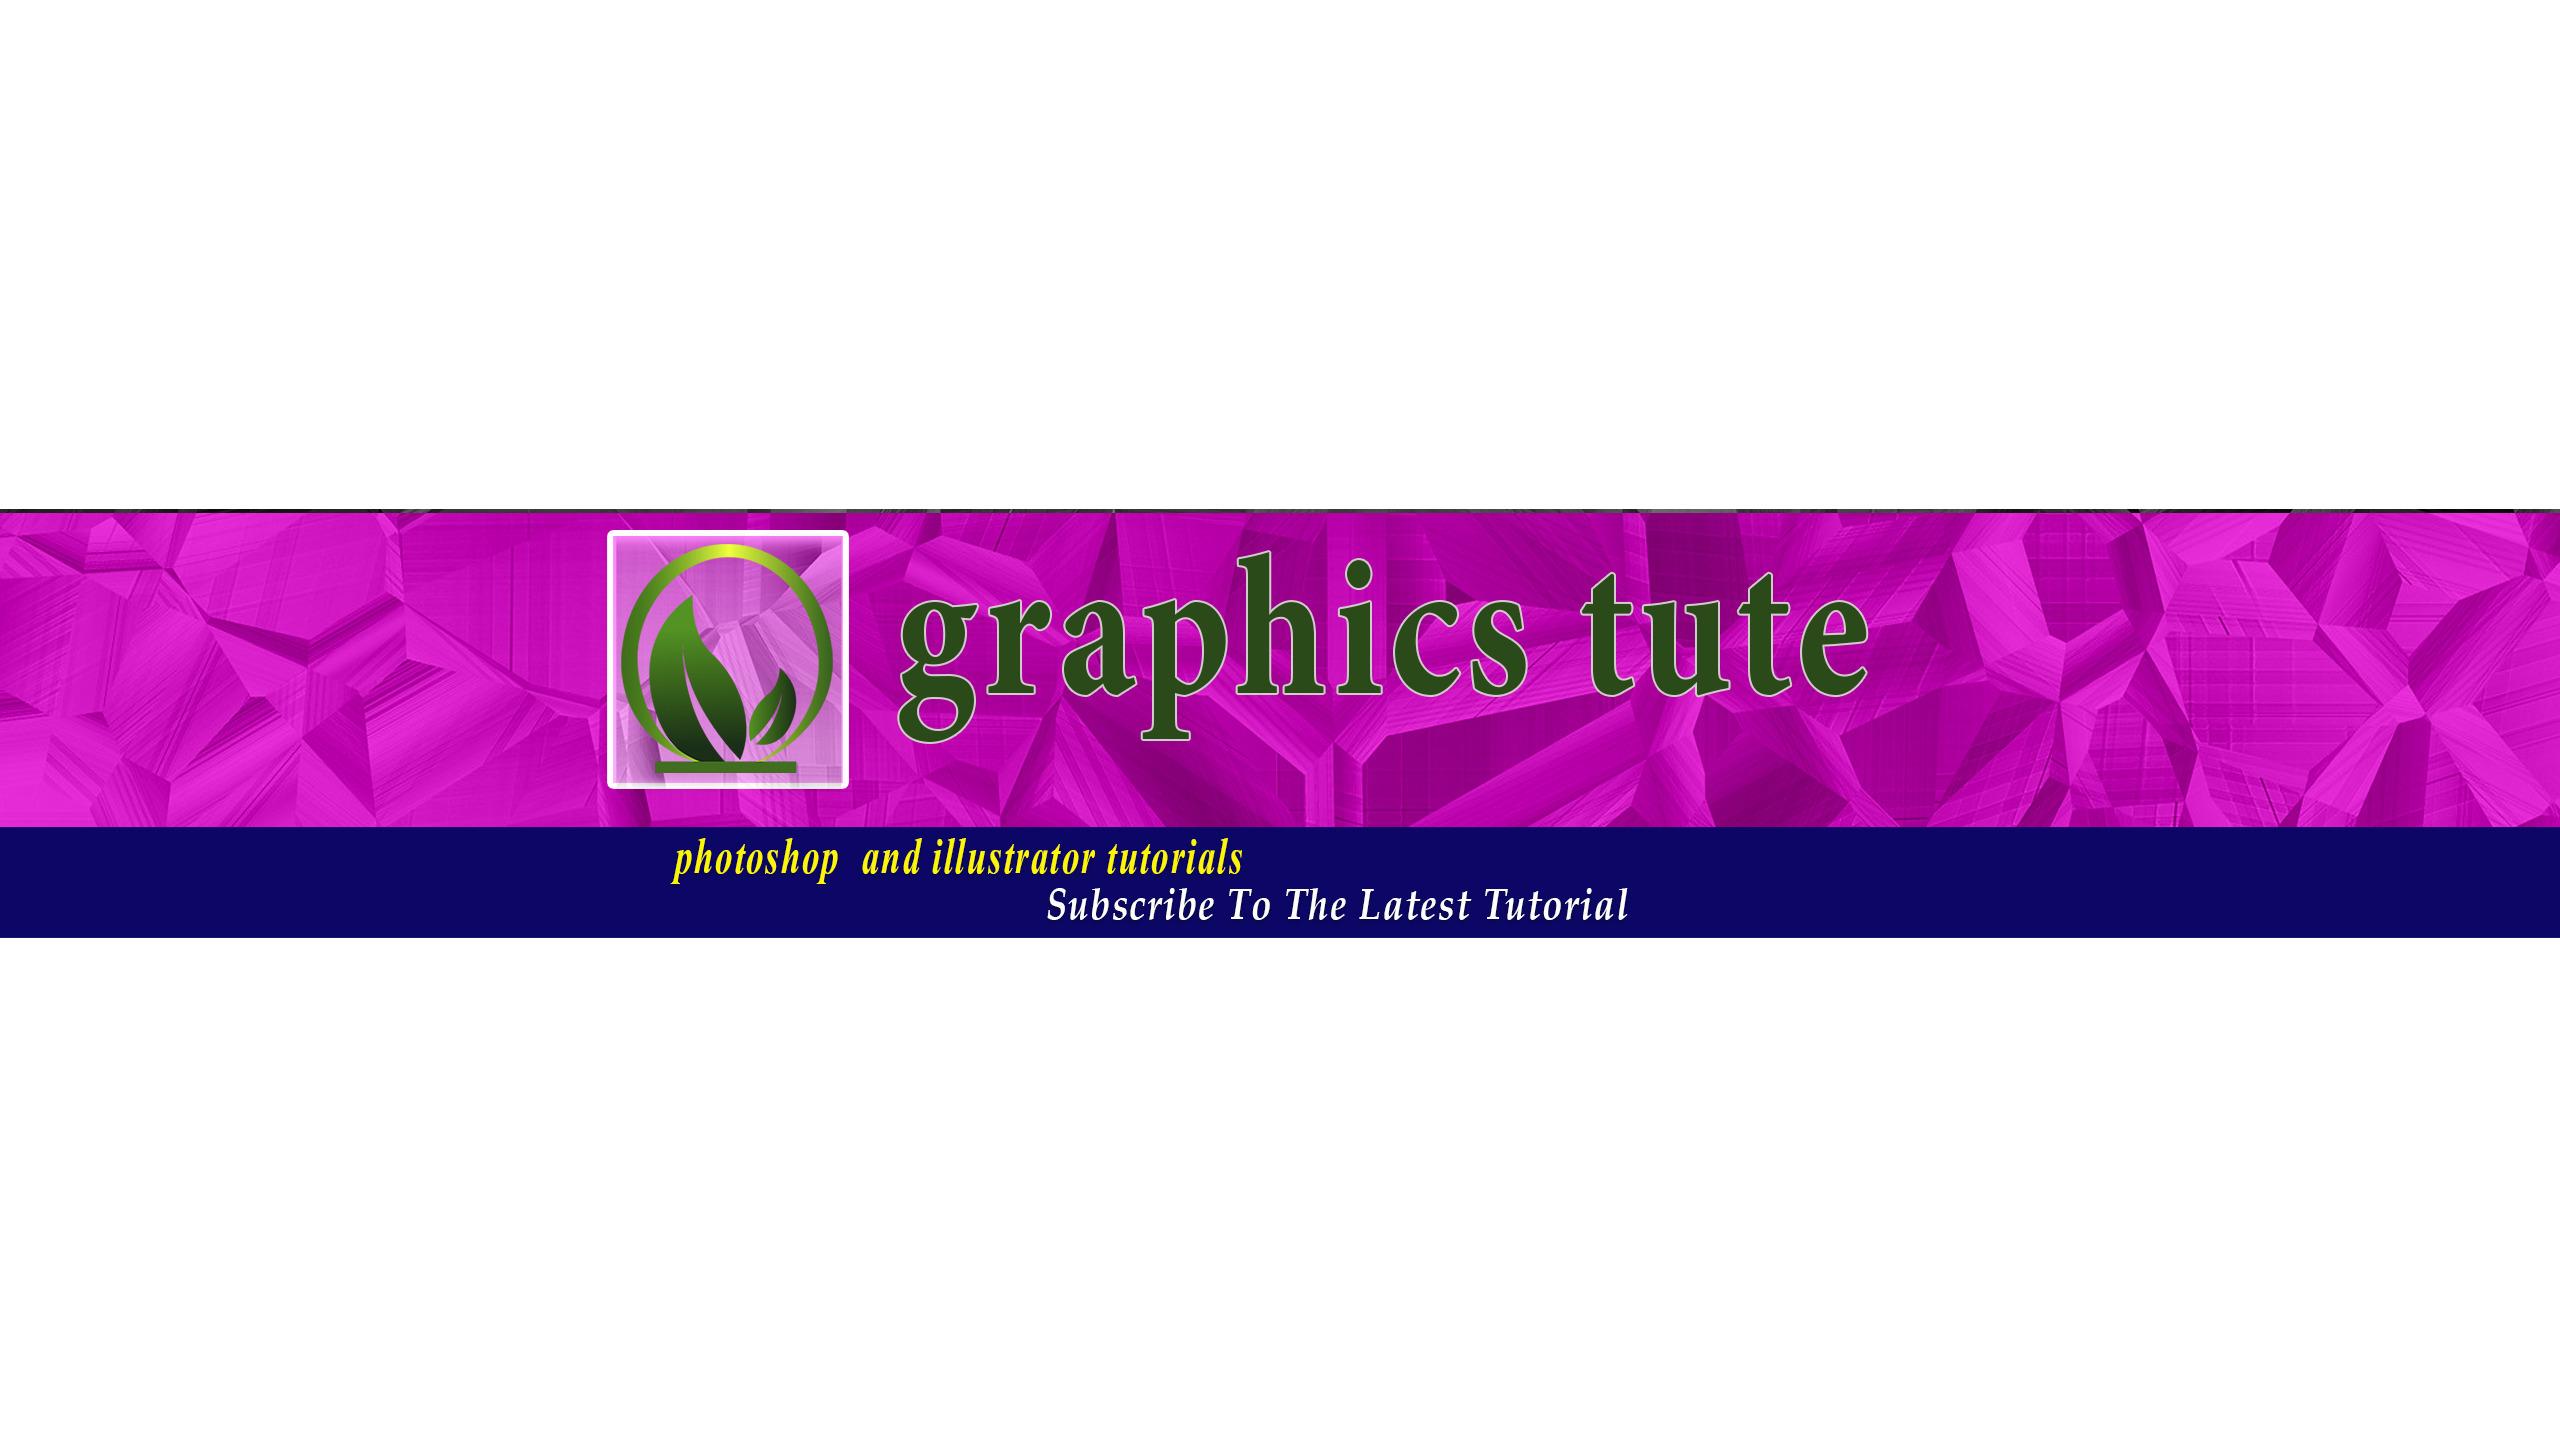 graphicstute (@graphicstute) Cover Image